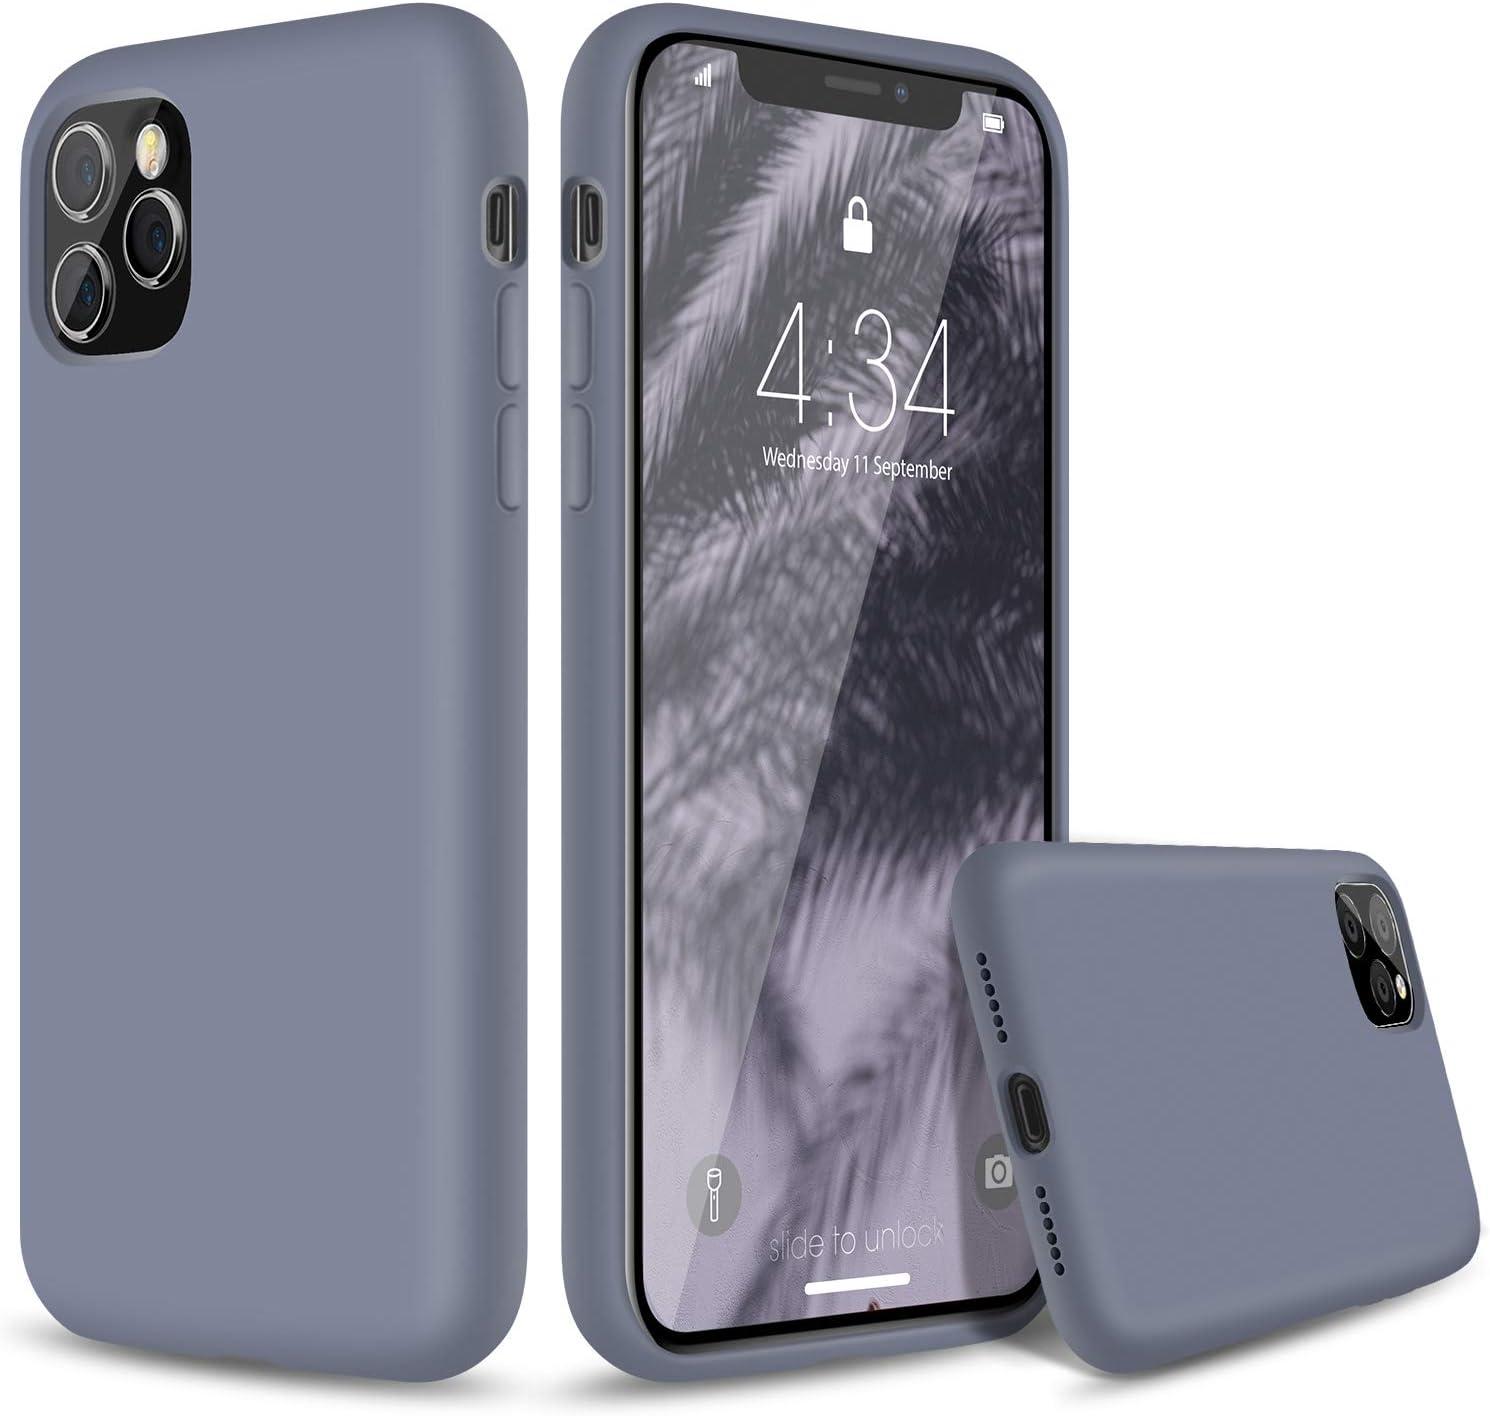 Abitku Iphone 11 Pro Max Hülle Silikon Case Elektronik